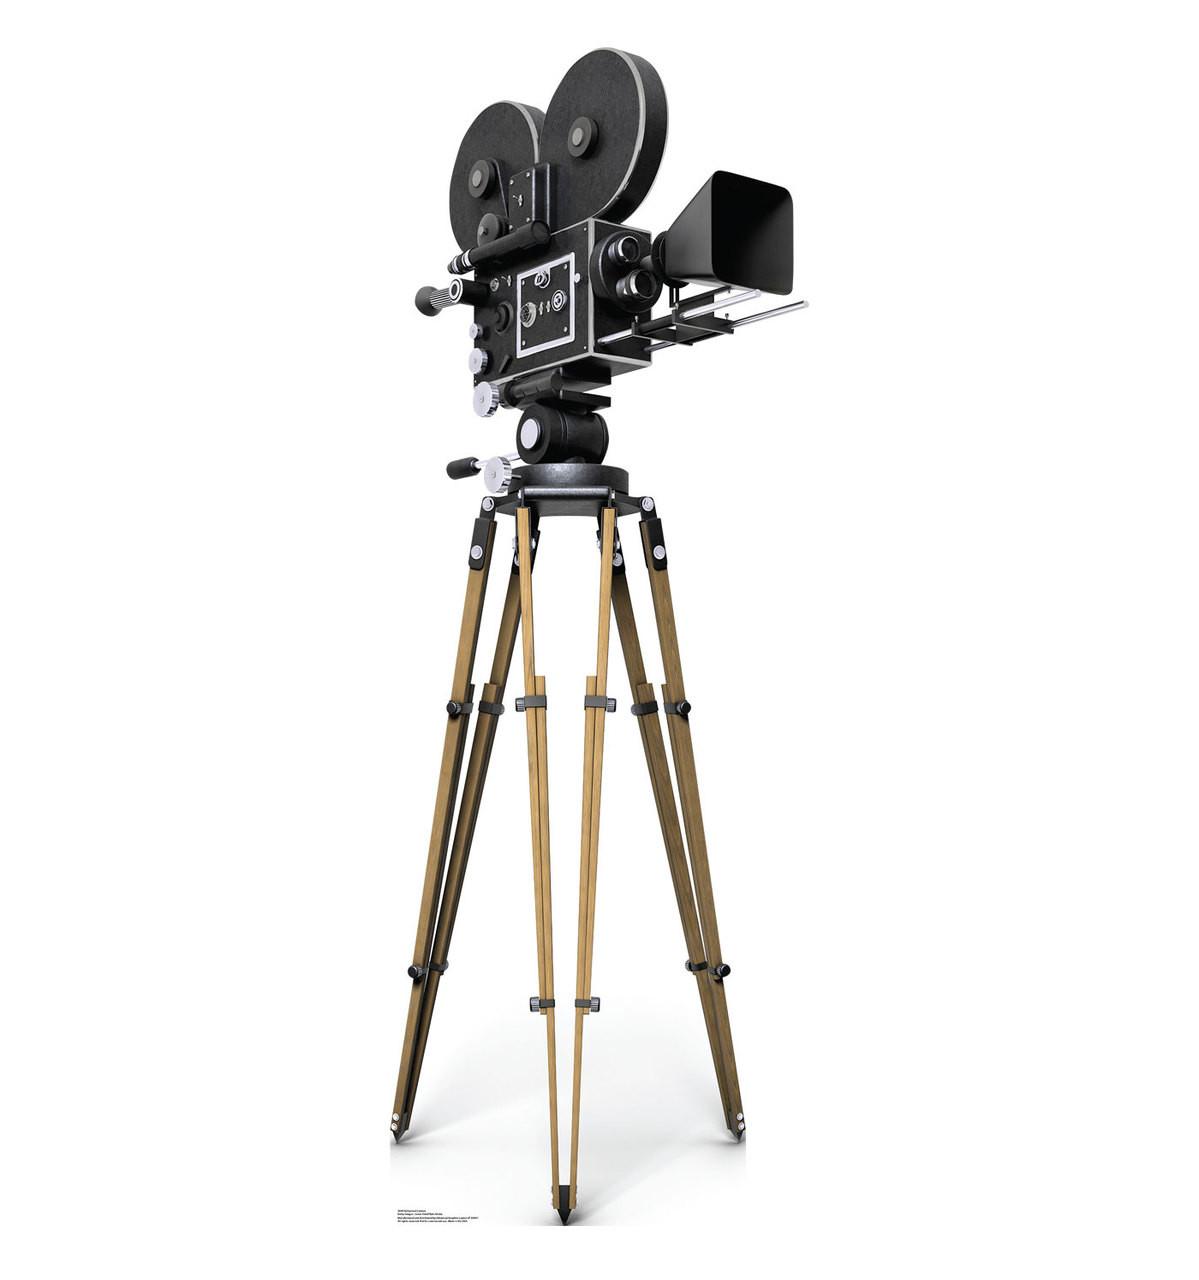 Life-size Hollywood Camera Cardboard Standup | Cardboard Cutout 1